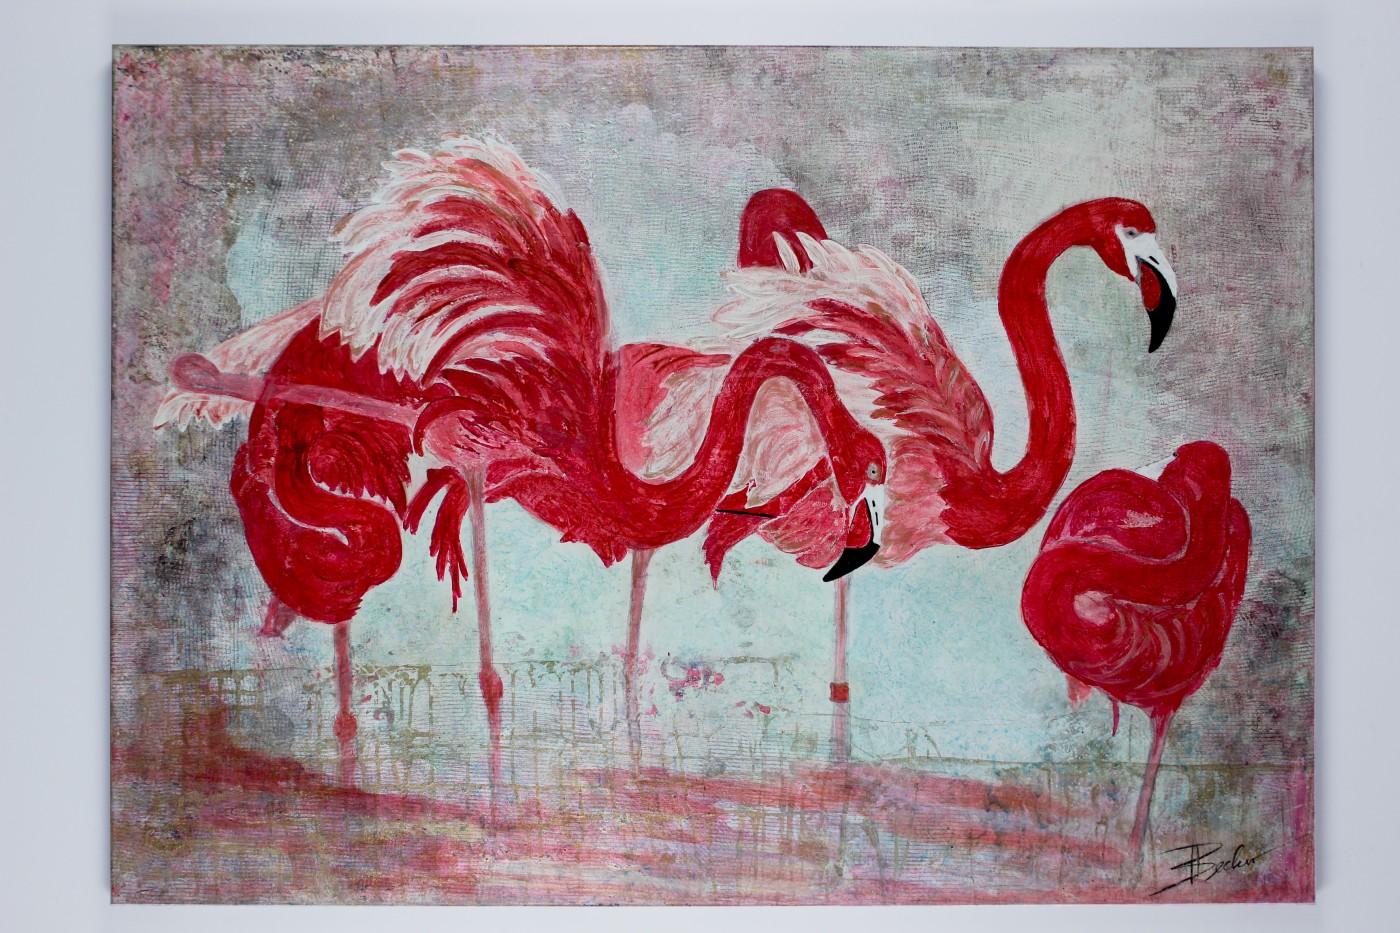 Tierwelt_FlamingosInRot_140x100